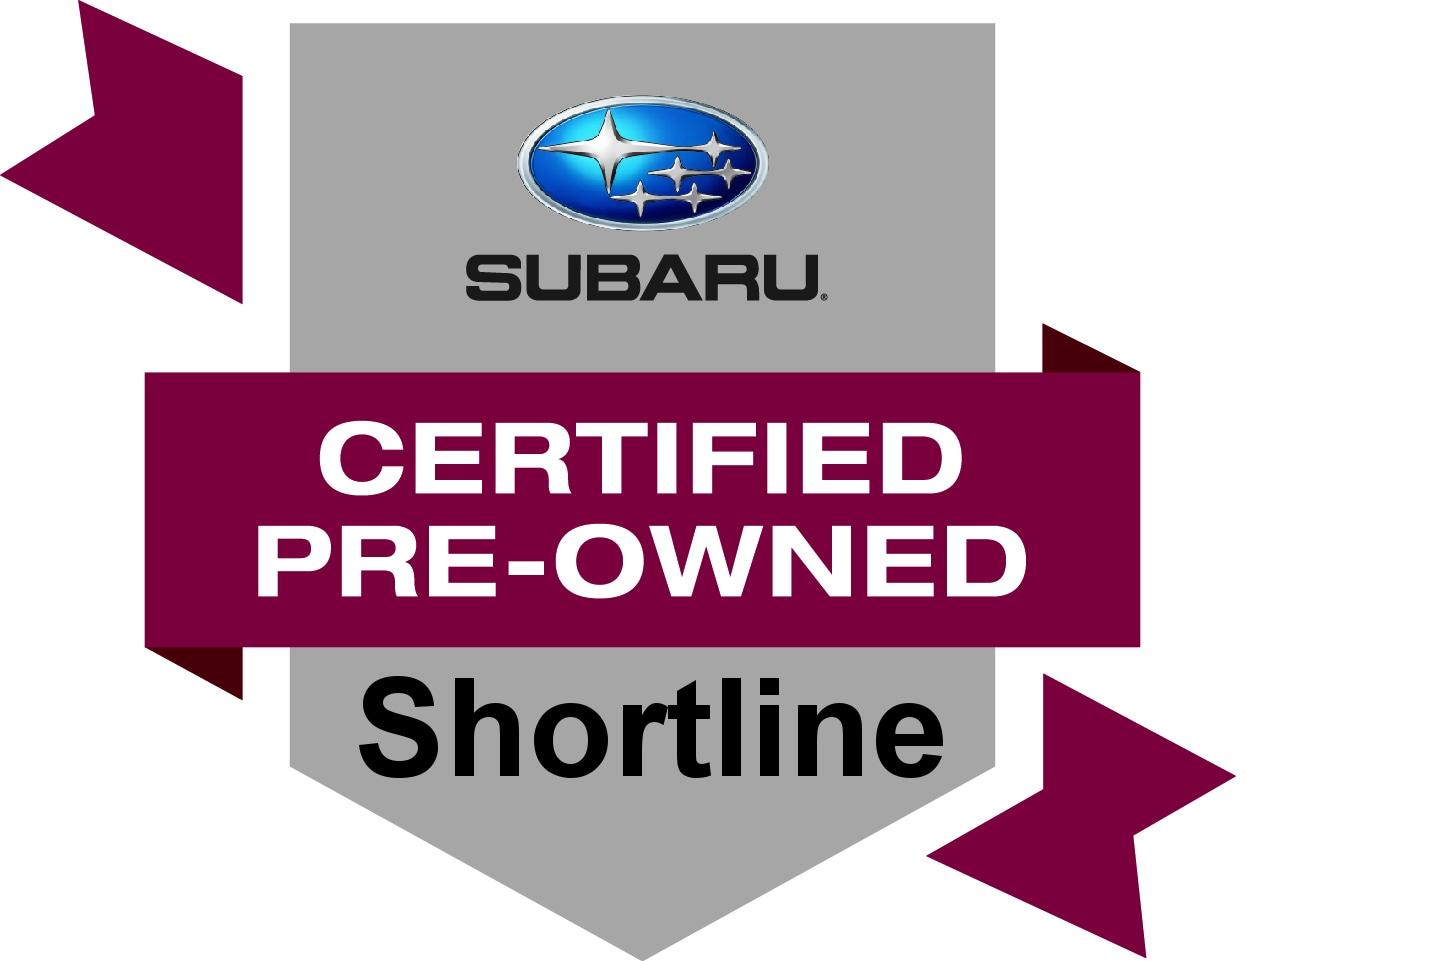 subaru certified pre owned subaru near denver shortline subaru cpo cars in aurora. Black Bedroom Furniture Sets. Home Design Ideas